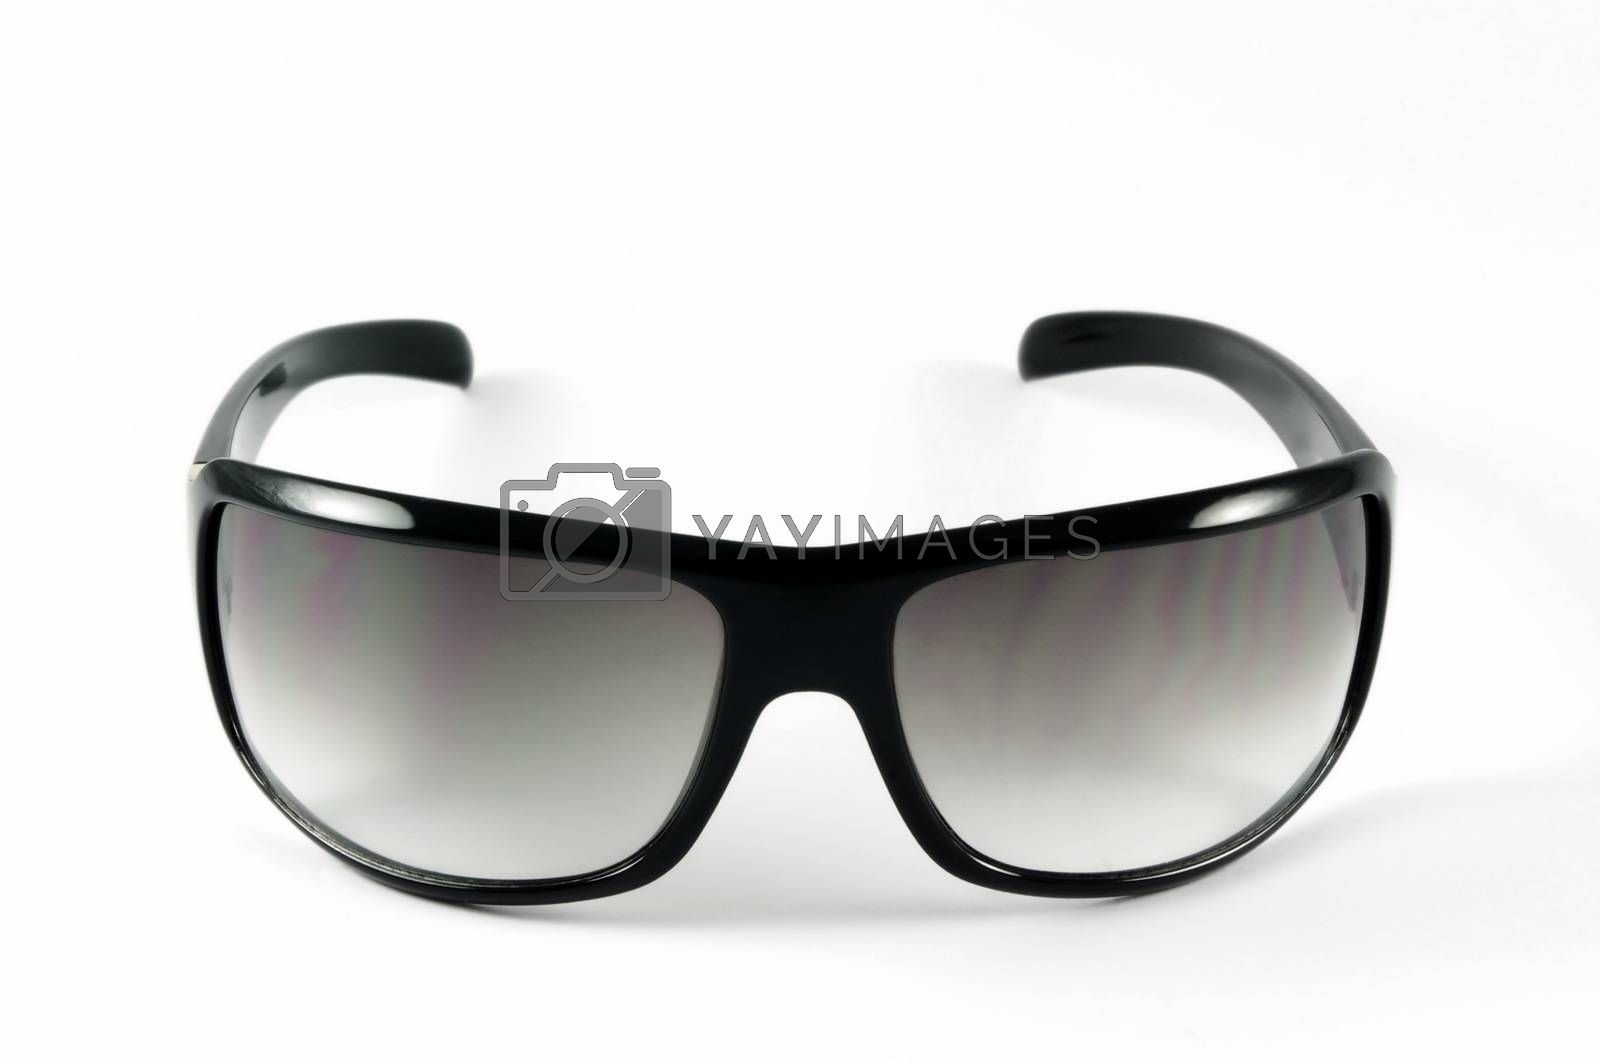 Modern sunglasses on white surface